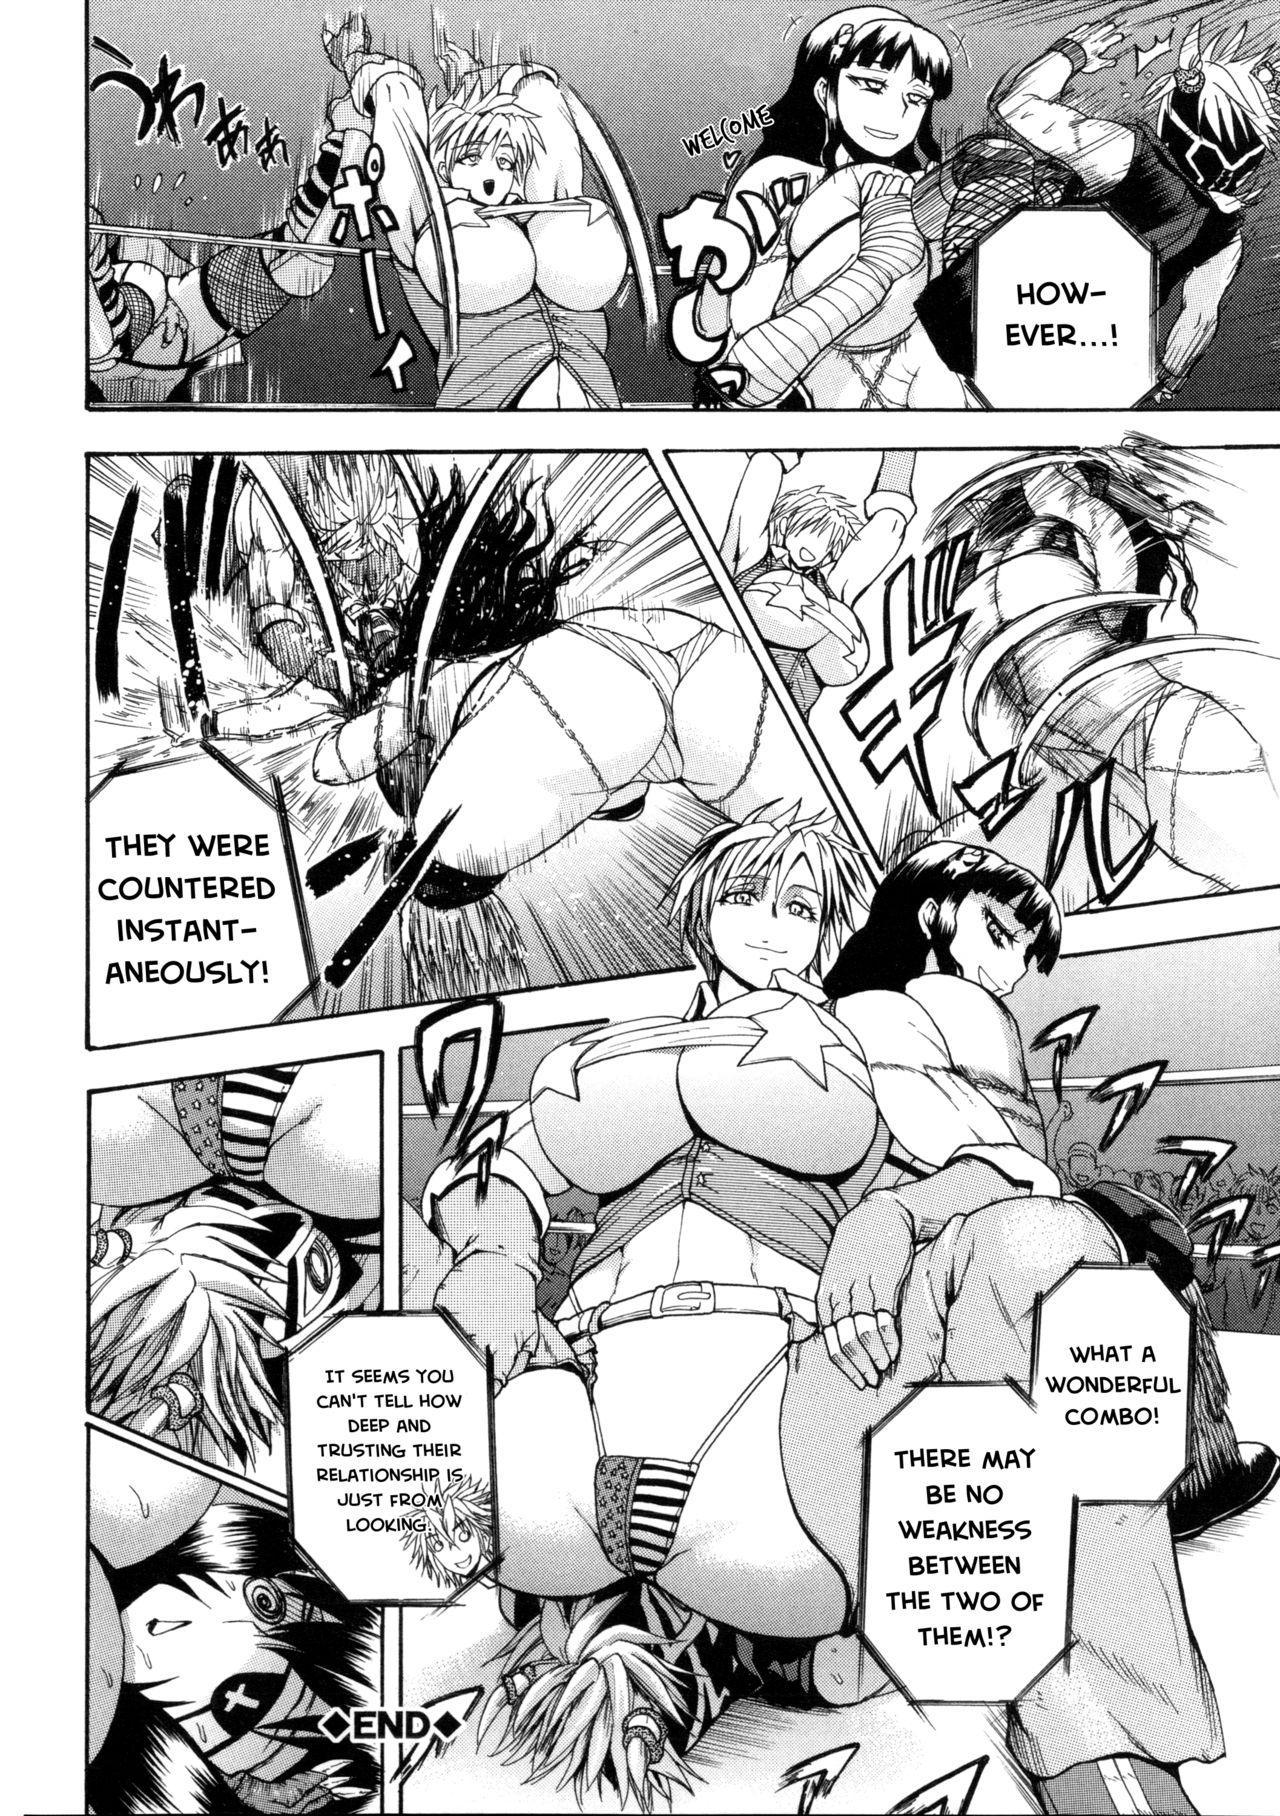 [Yoshimura Tatsumaki] Monzetsu Taigatame ~Count 3 de Ikasete Ageru~ | Faint in Agony Bodylock ~I'll make you cum on the count of 3~ [English] [Brolen] 110